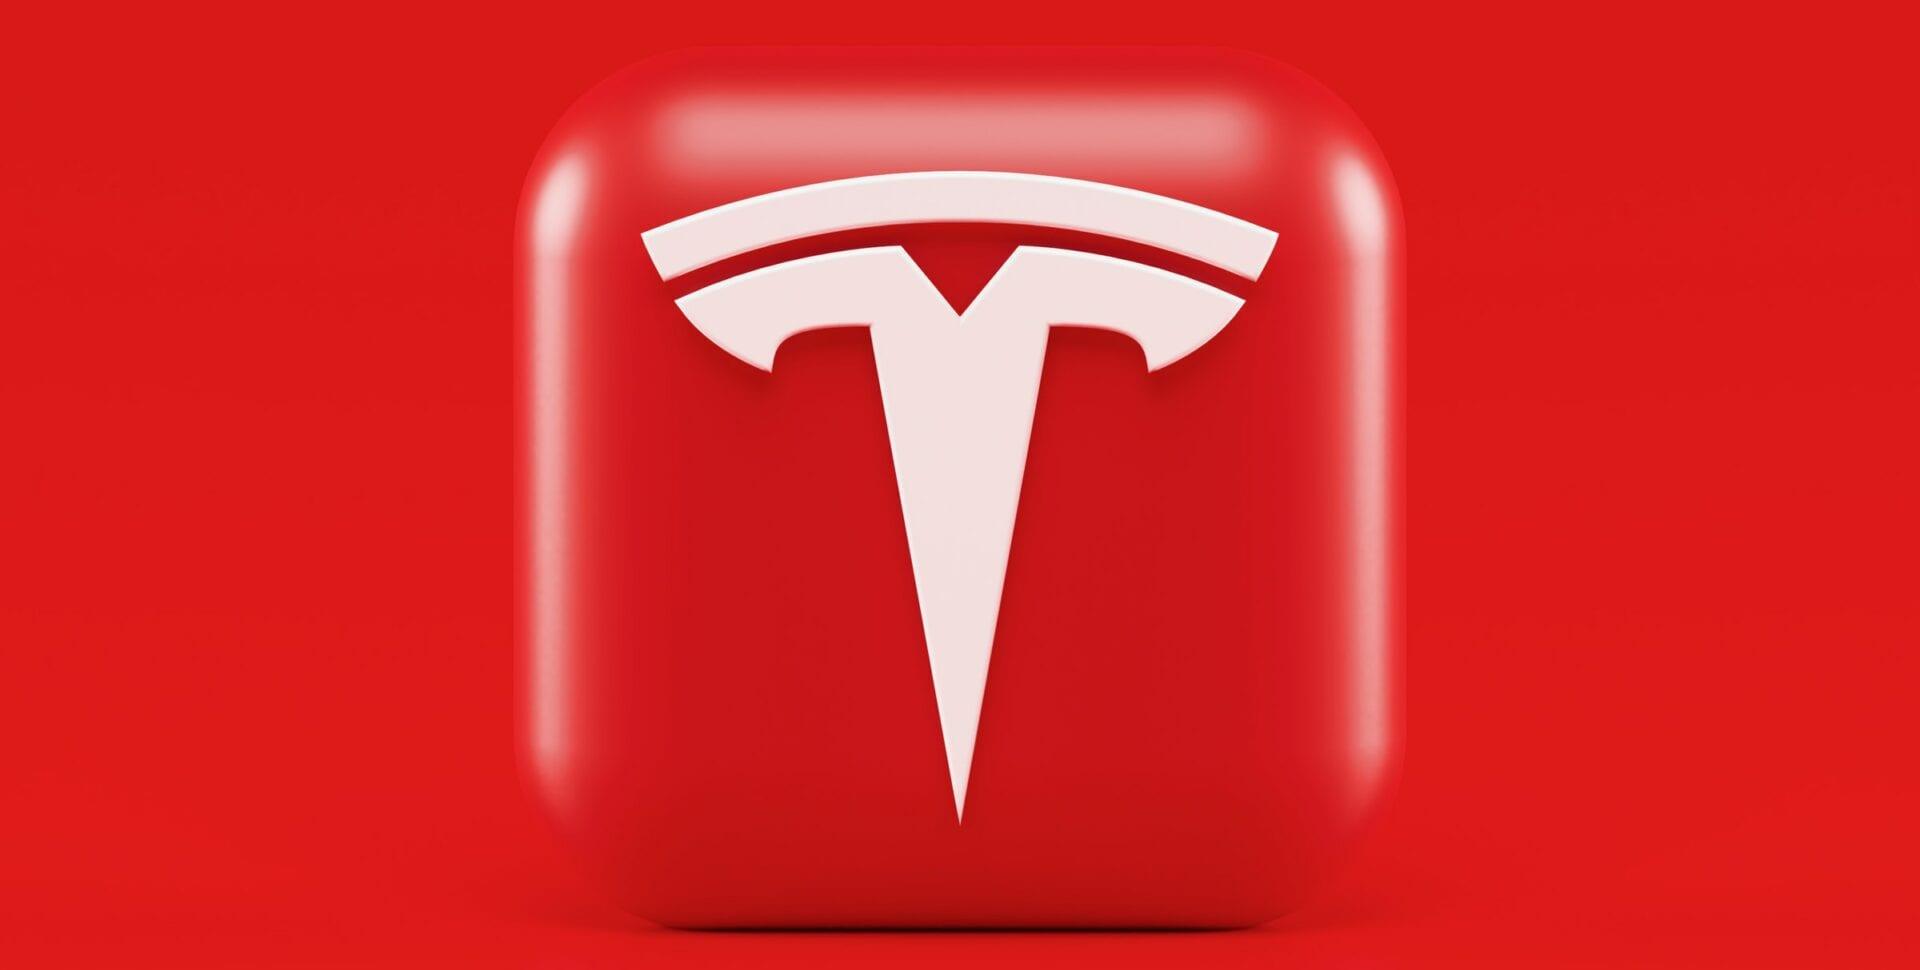 Tesla LG